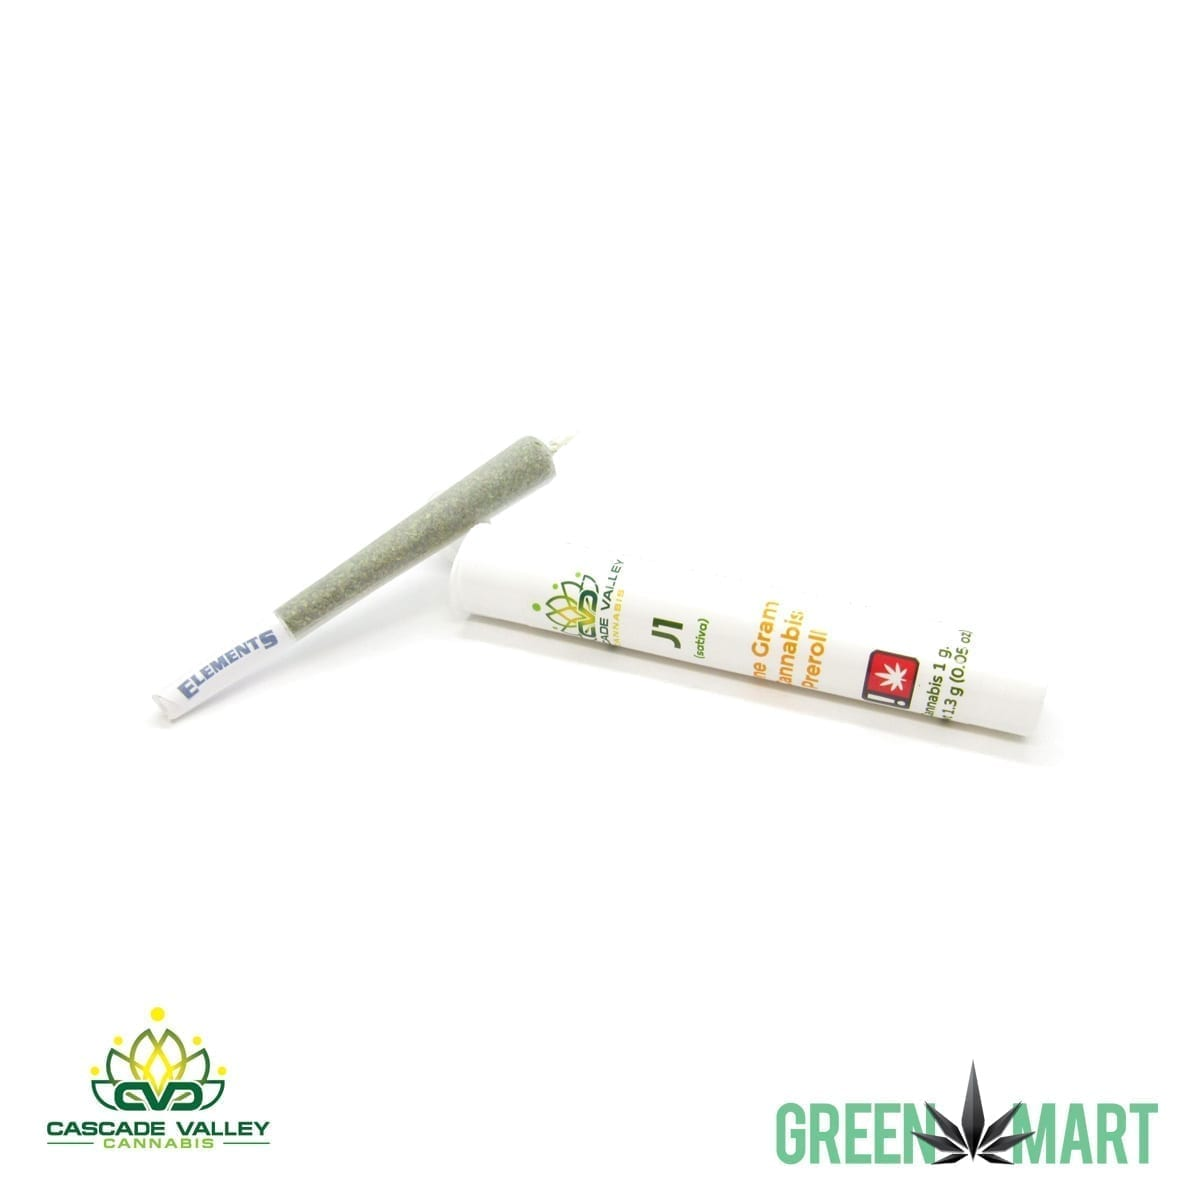 J1 Full Gram Pre-roll by Cascade Valley Cannabis